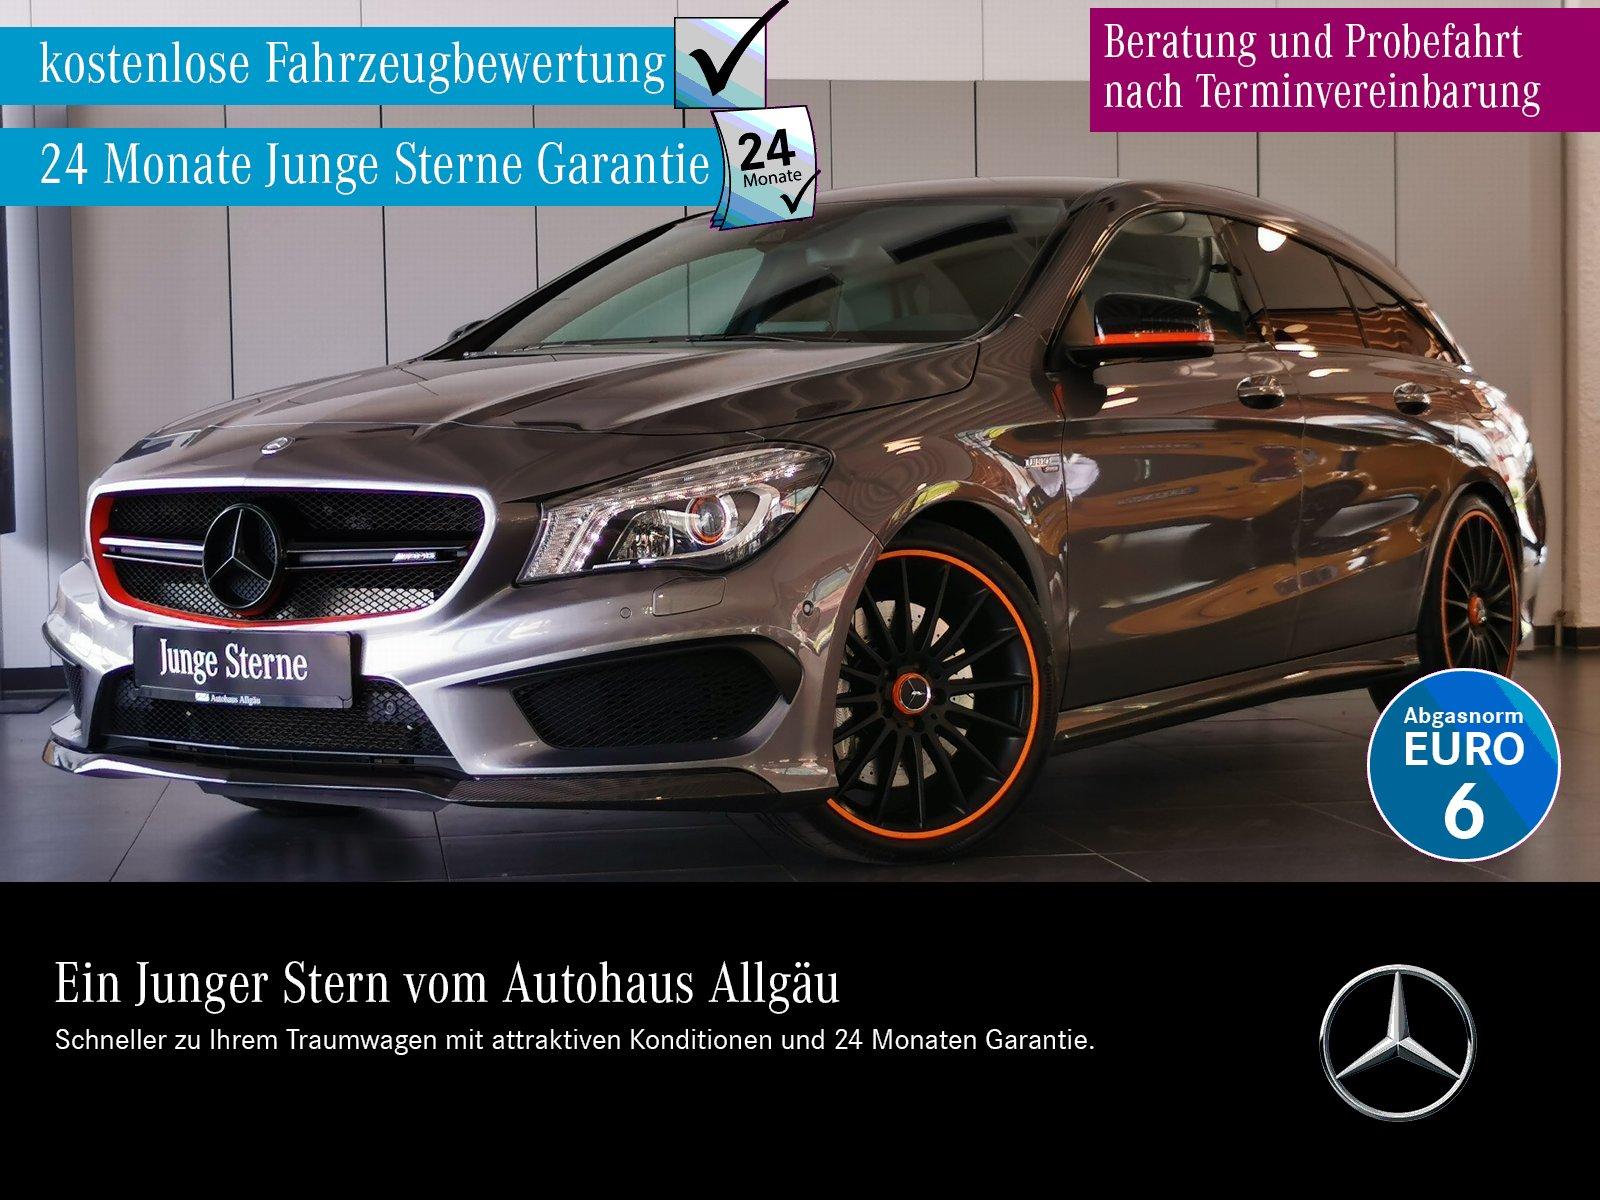 Mercedes-Benz CLA 45 AMG 4M SB ILS+DAB+NAVI+KAMERA+PERF.SITZE+, Jahr 2015, Benzin